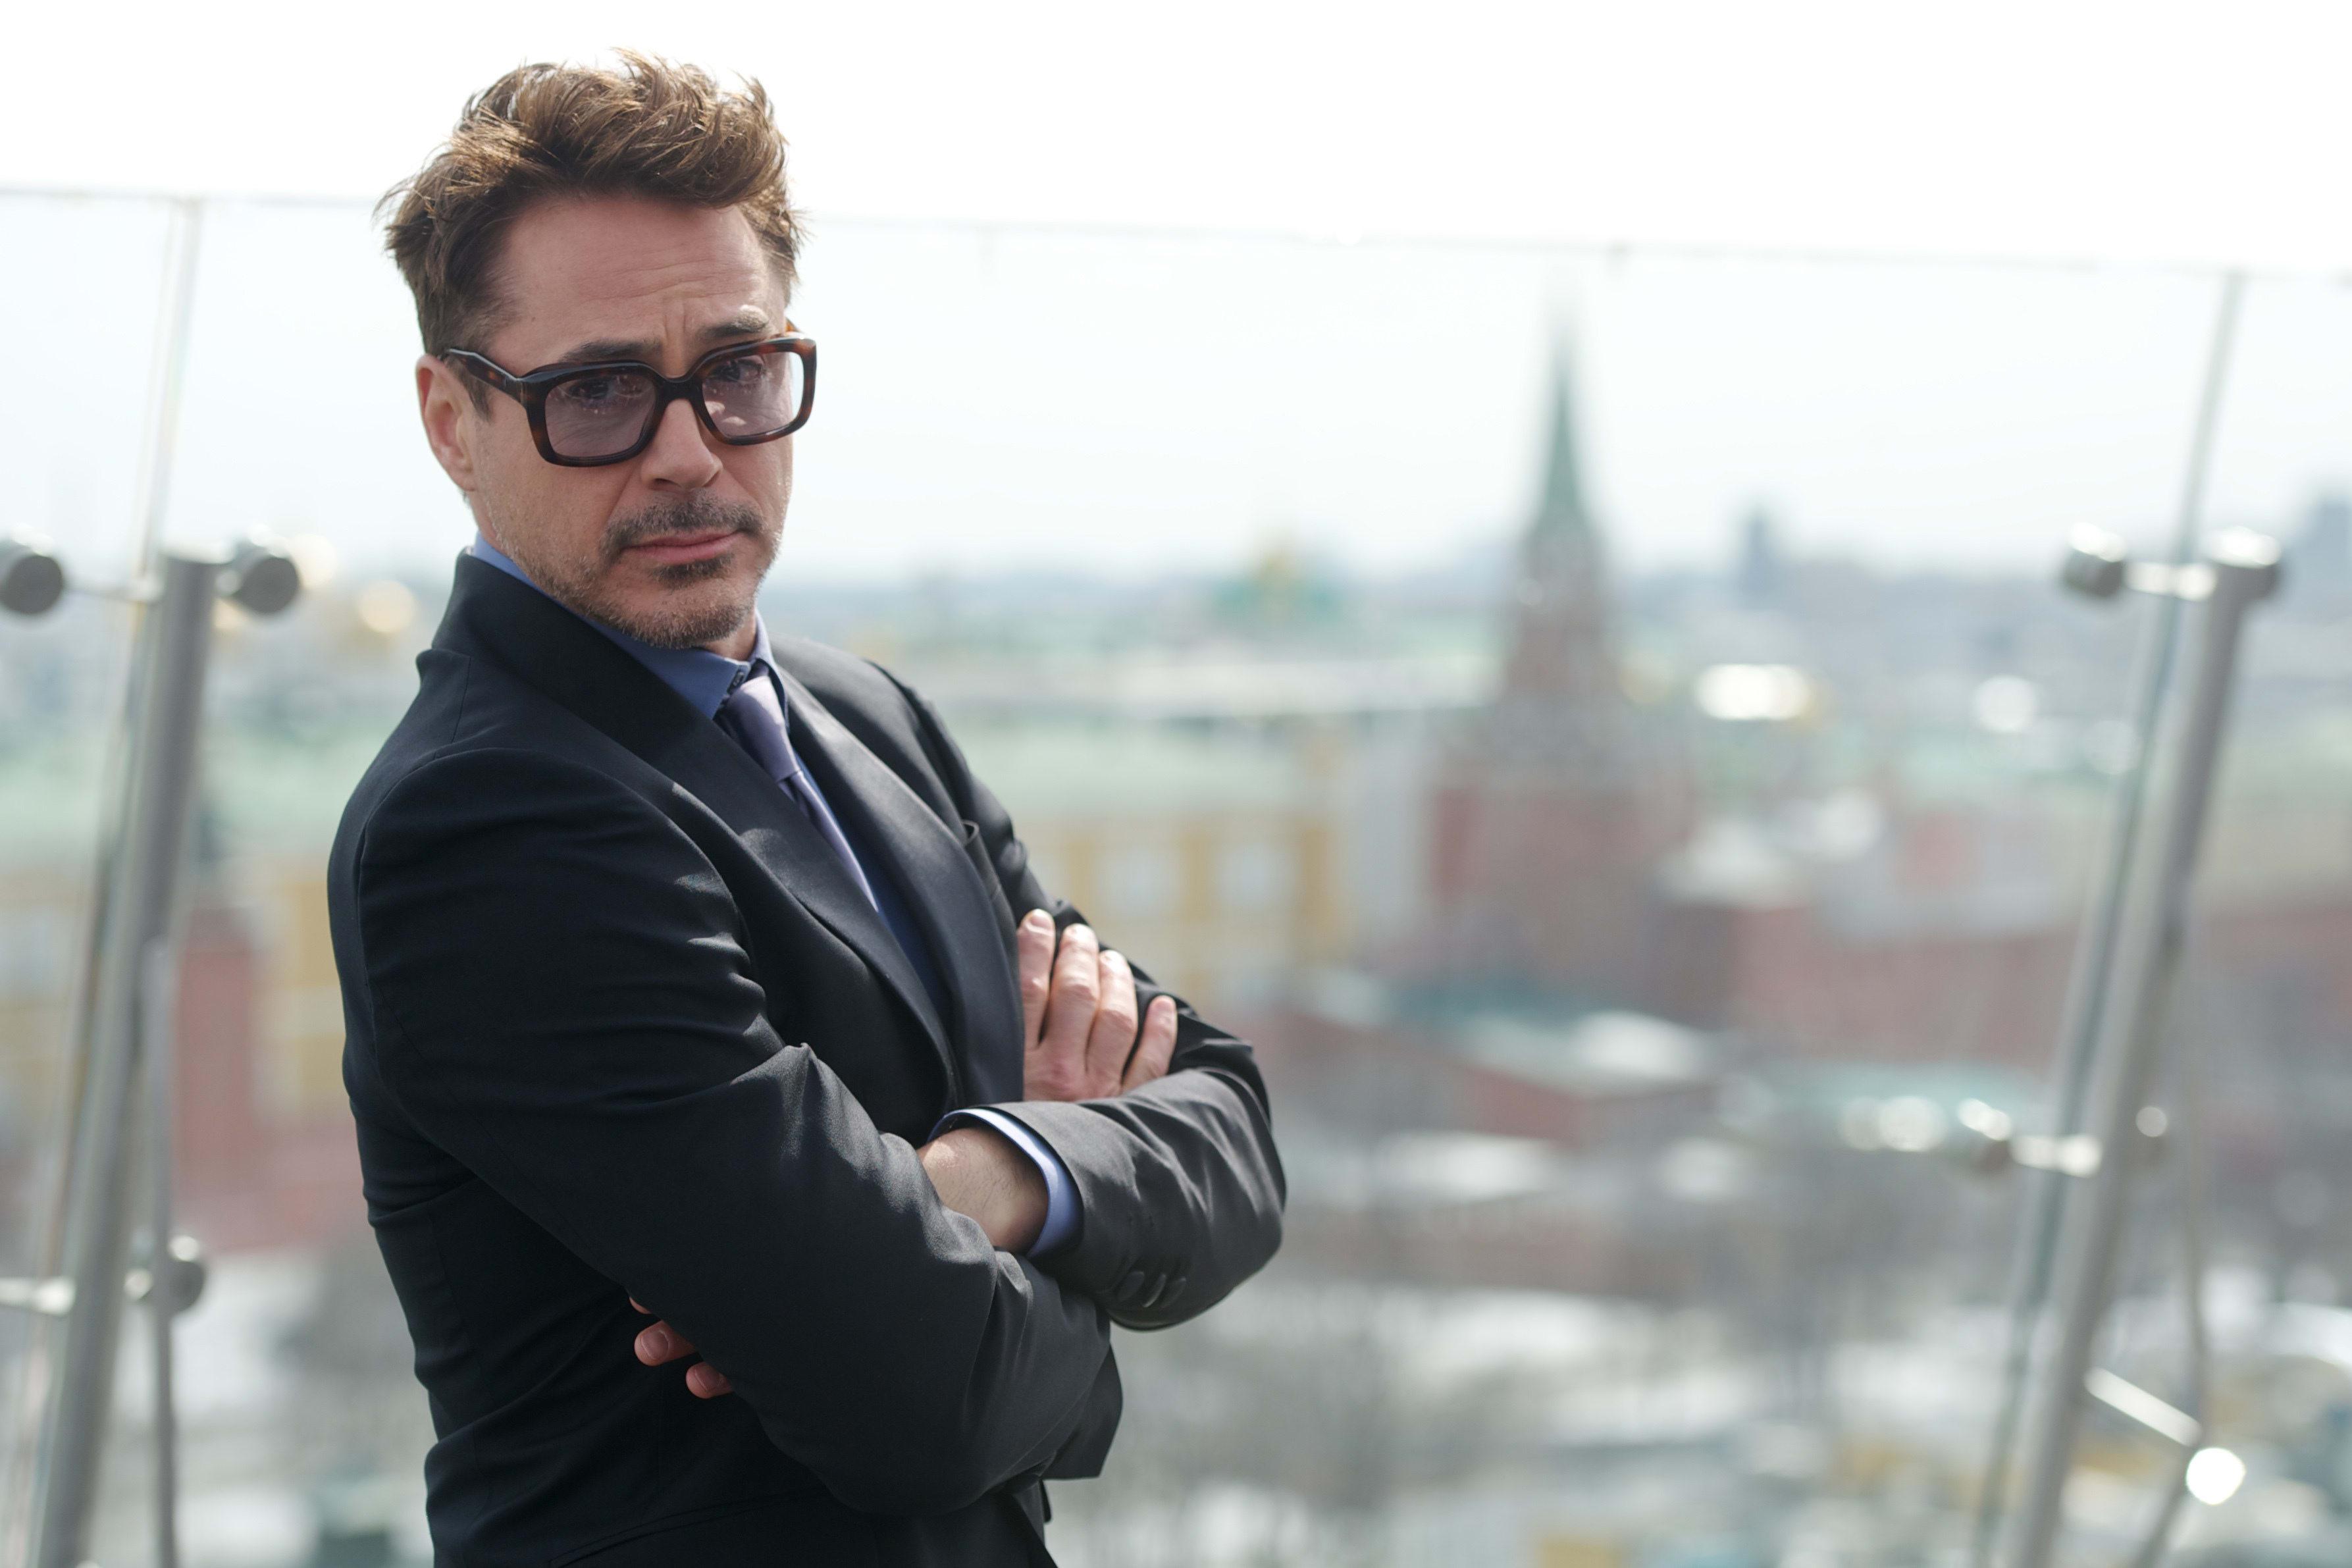 Robert Downey Jr The Hollywood Gossip